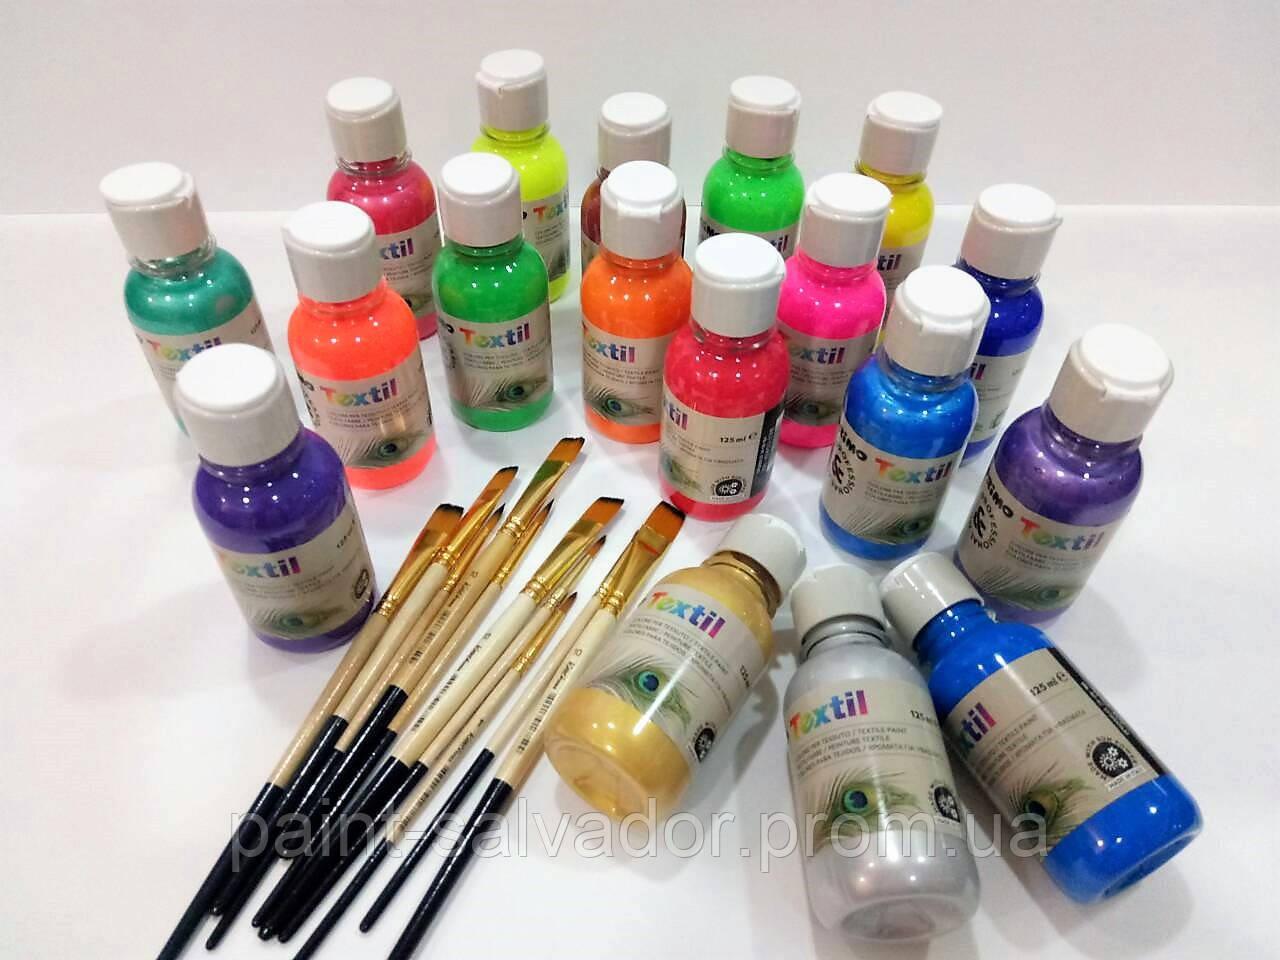 Краски по текстилю на акриловой основе от итальянской ТМ PRIMO